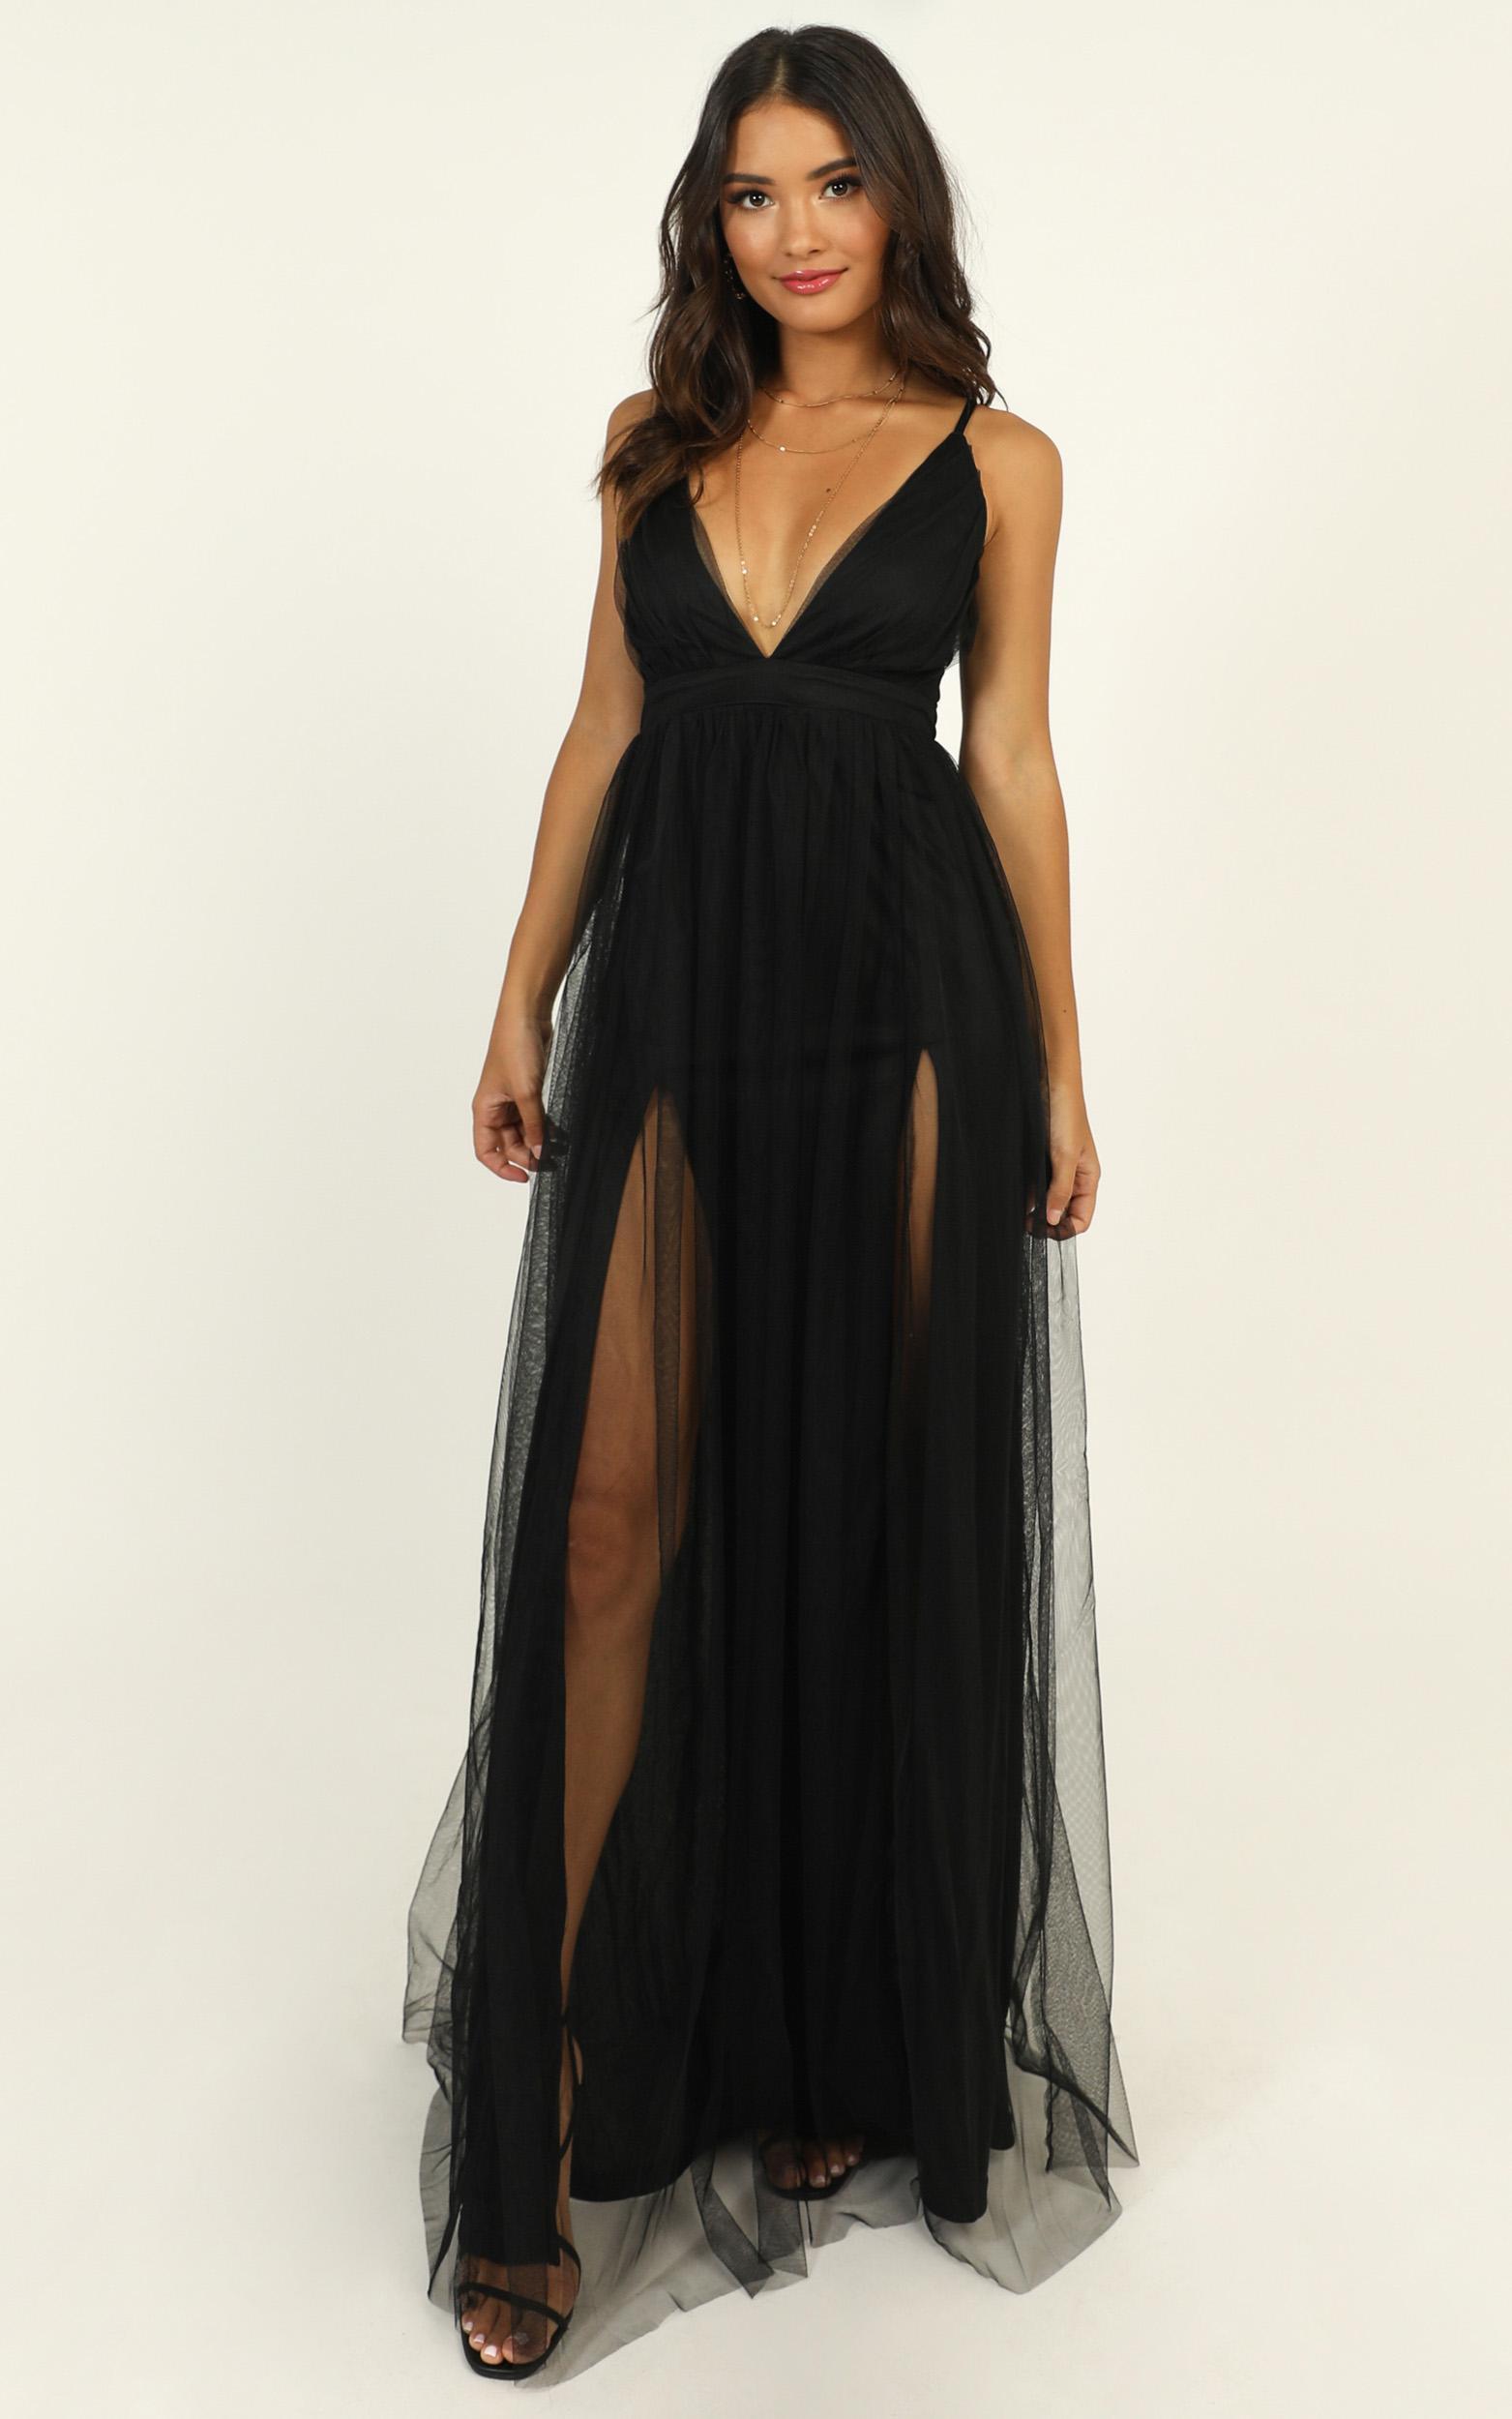 Like A Vision Dress in black mesh - 14 (XL), Black, hi-res image number null